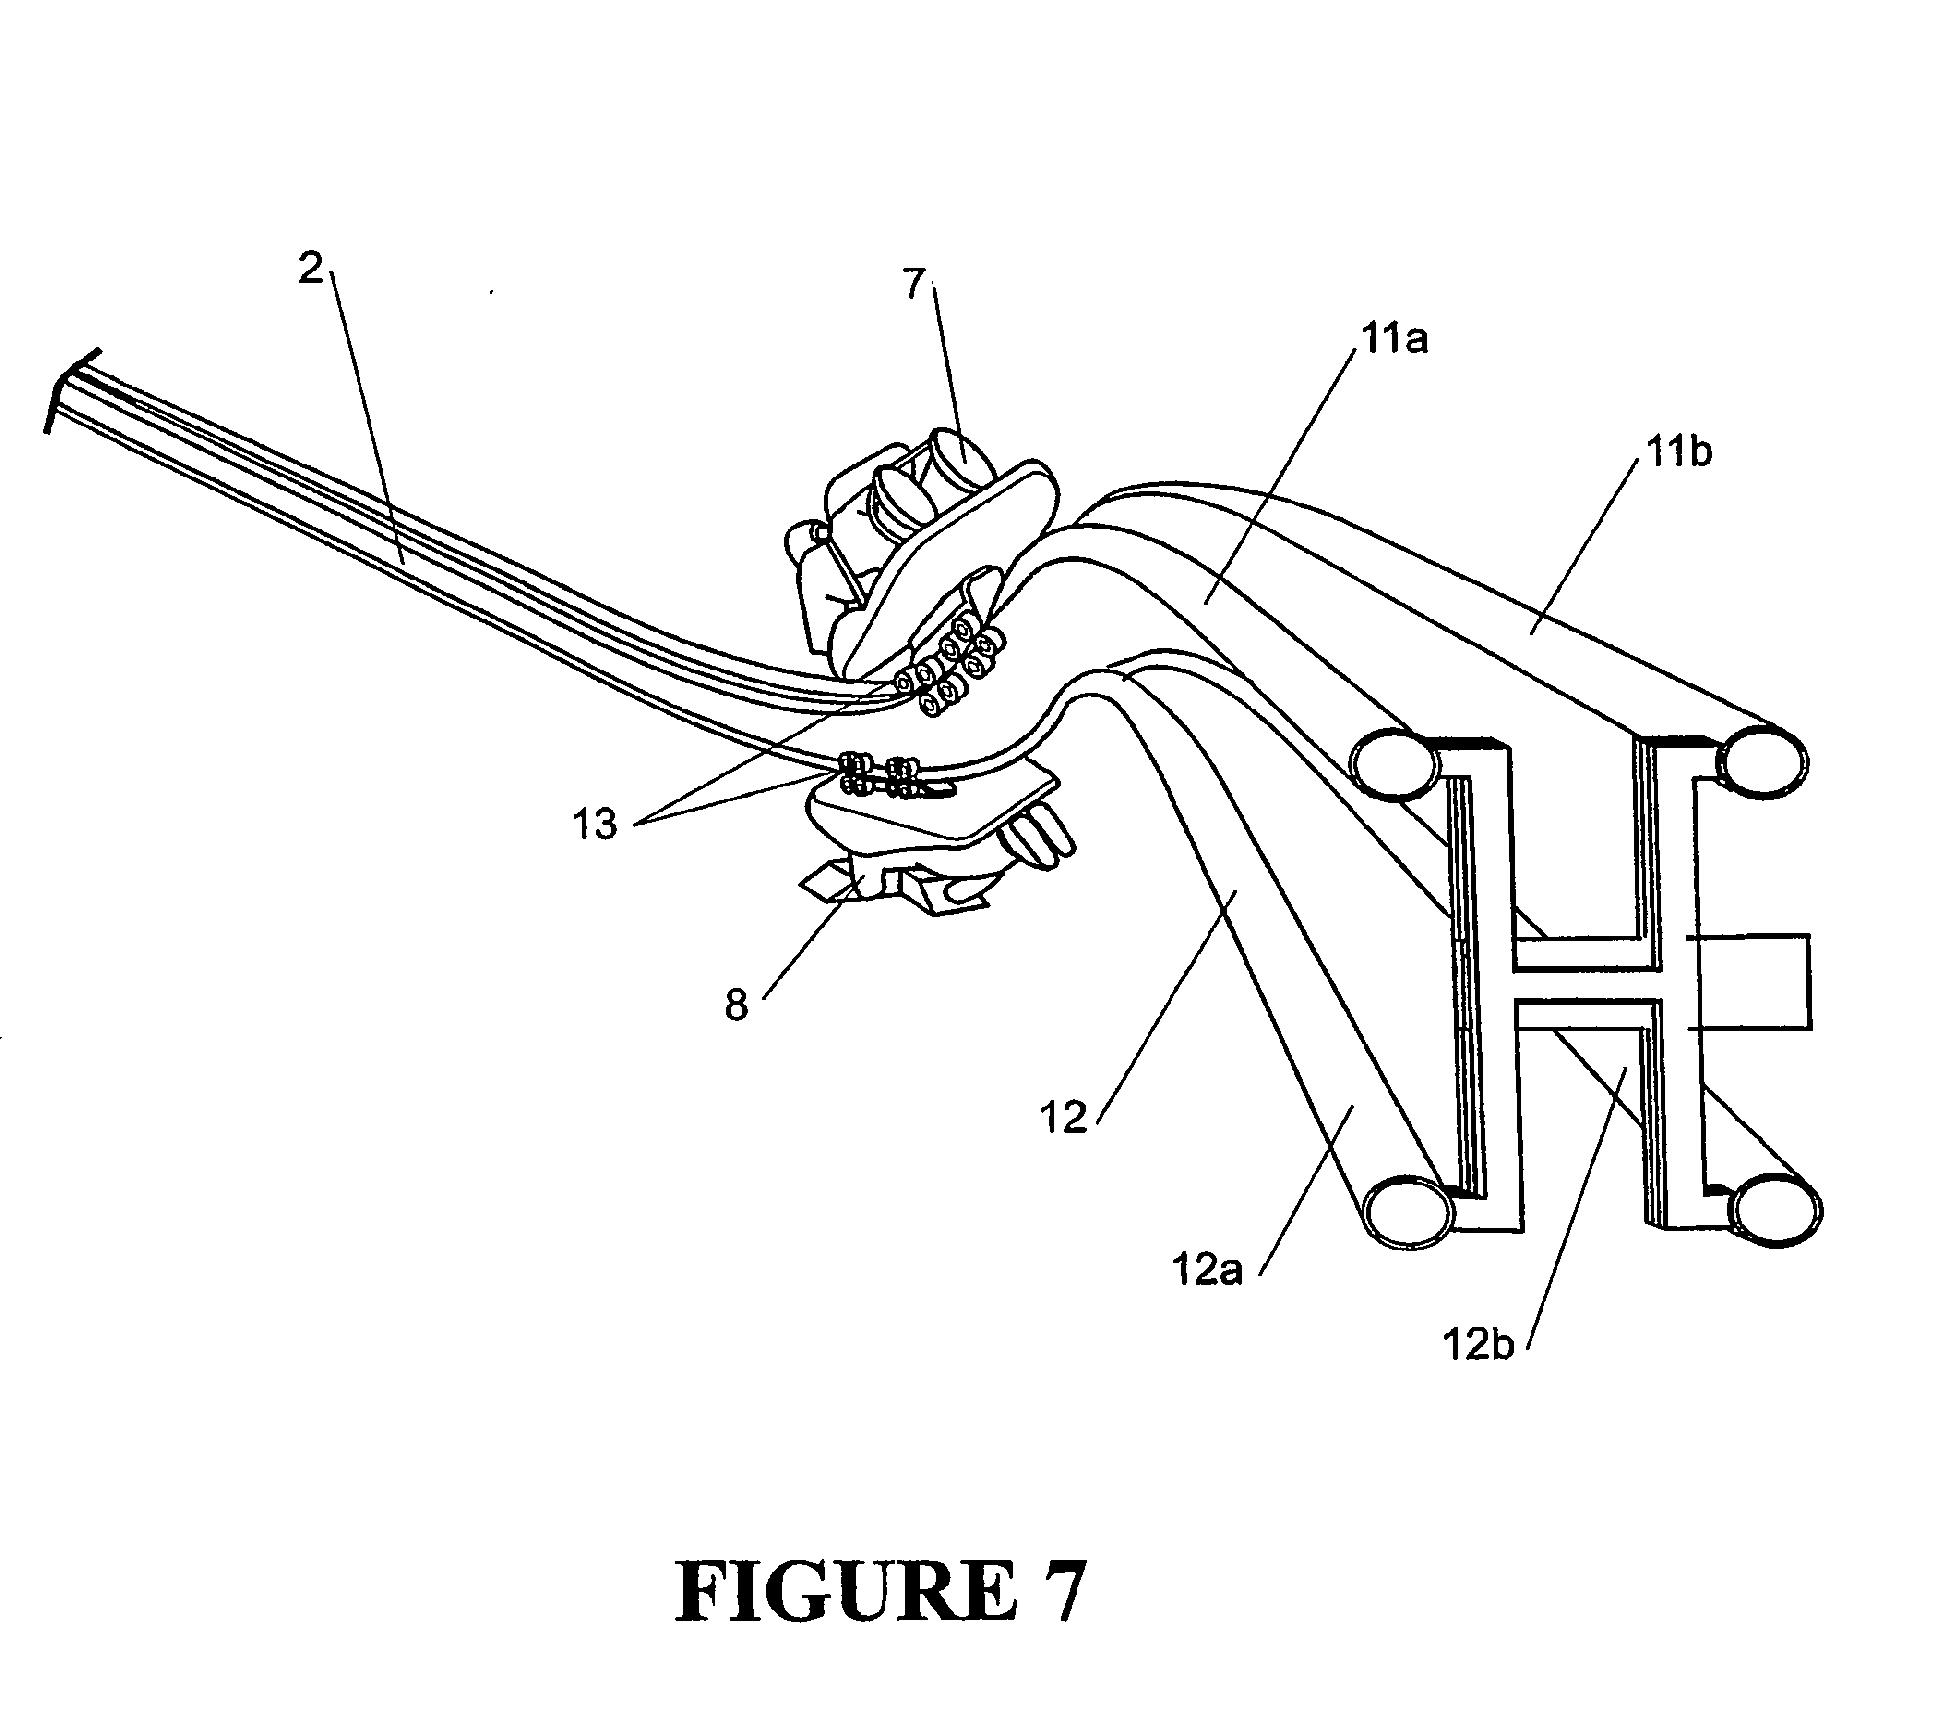 Roller Coaster Dimensions Diagram Modern Design Of Wiring Drawing Bending Moment Diagrams Patent Ep1912715b1 Drag Racing Amusement Layouts